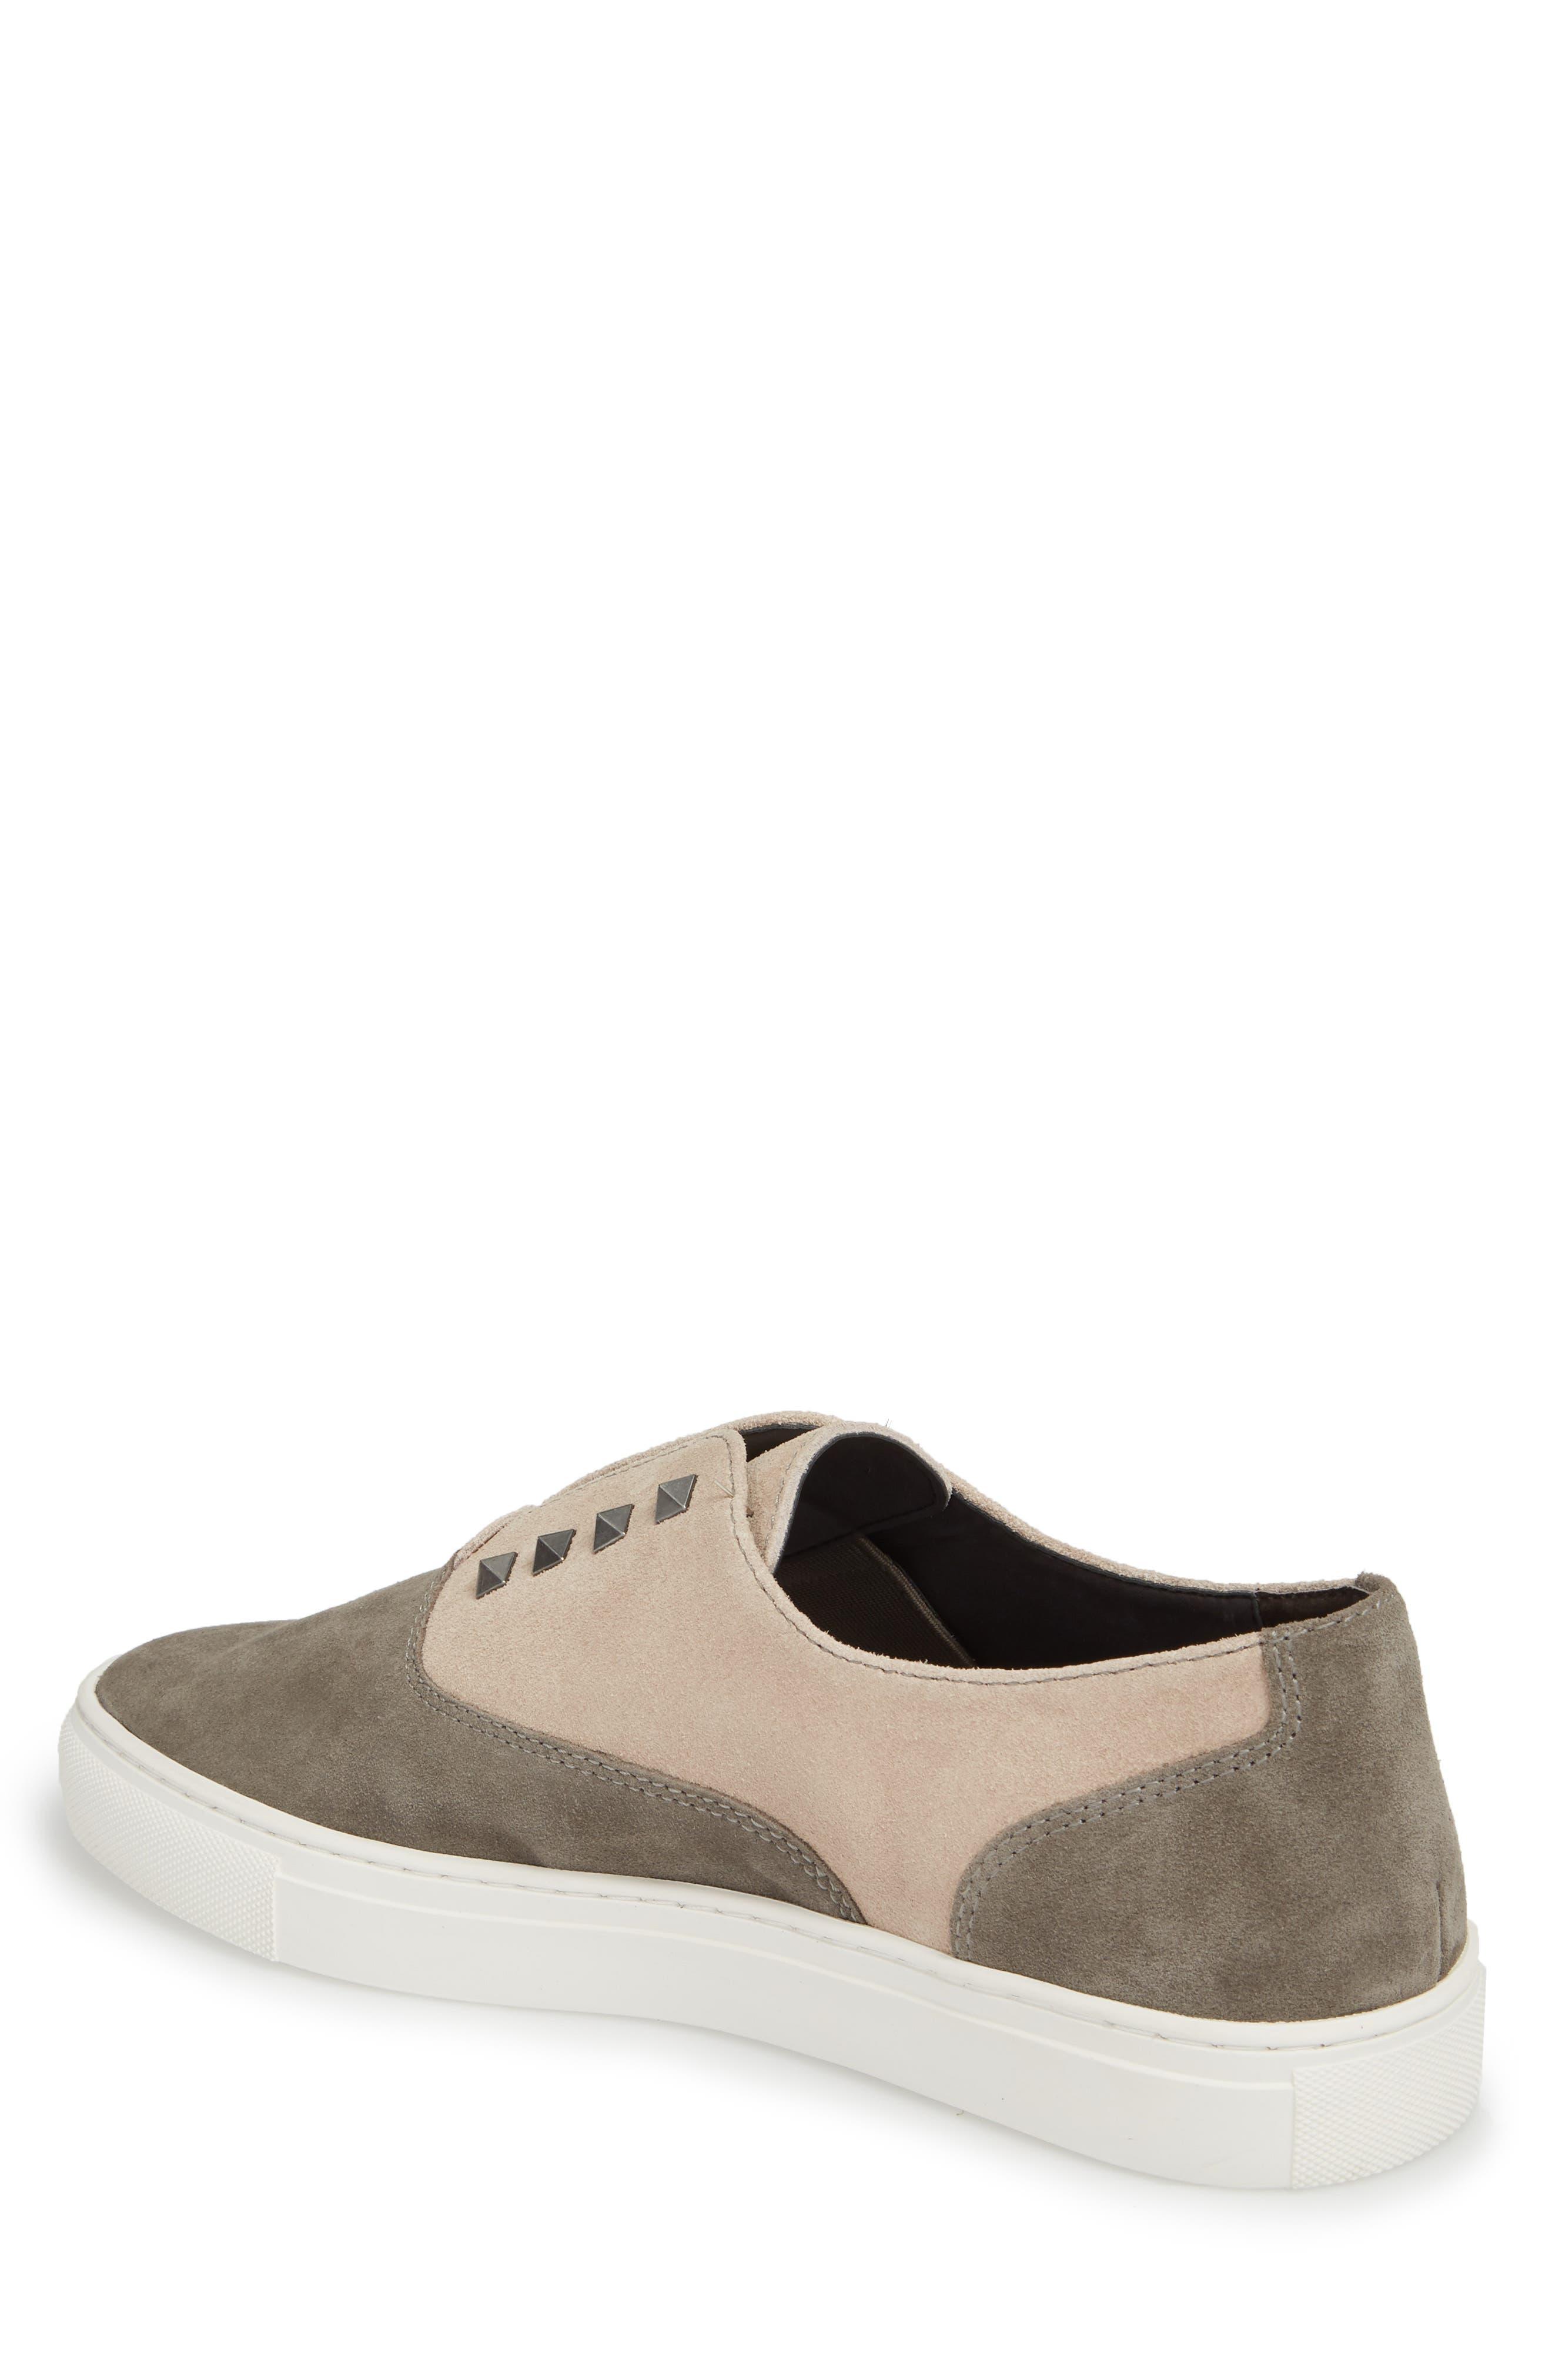 Aryo Studded Laceless Sneaker,                             Alternate thumbnail 4, color,